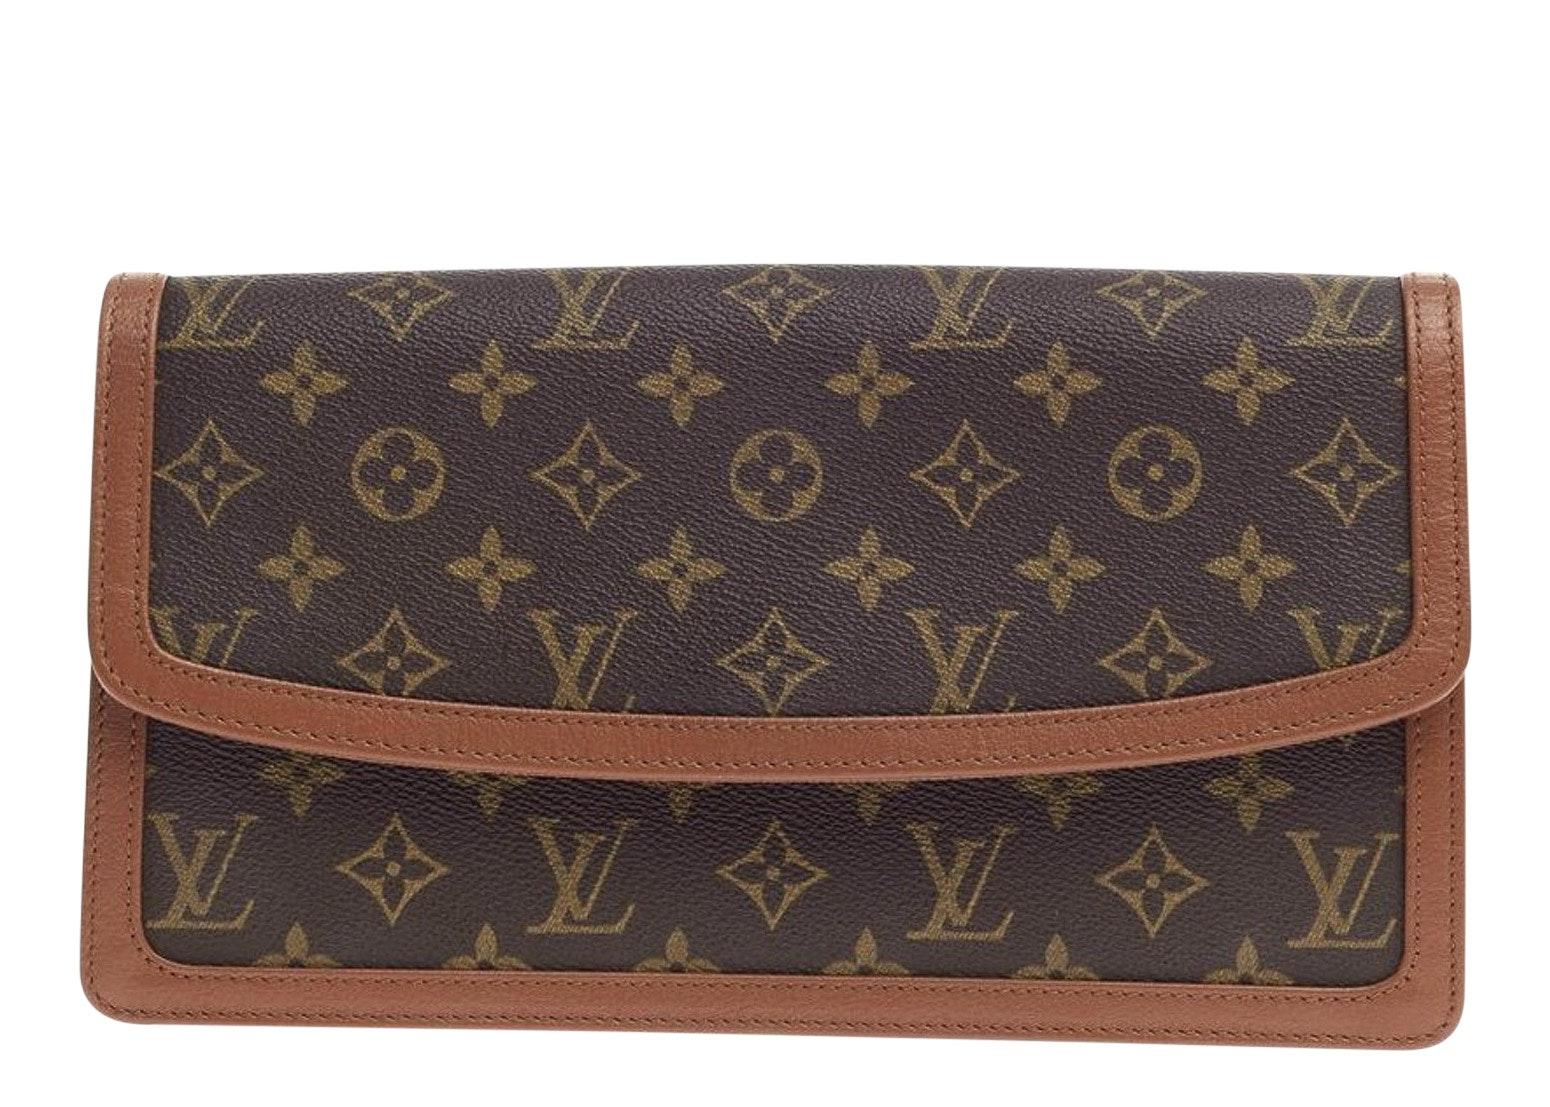 Louis Vuitton Dame Pochette Monogram GM Brown